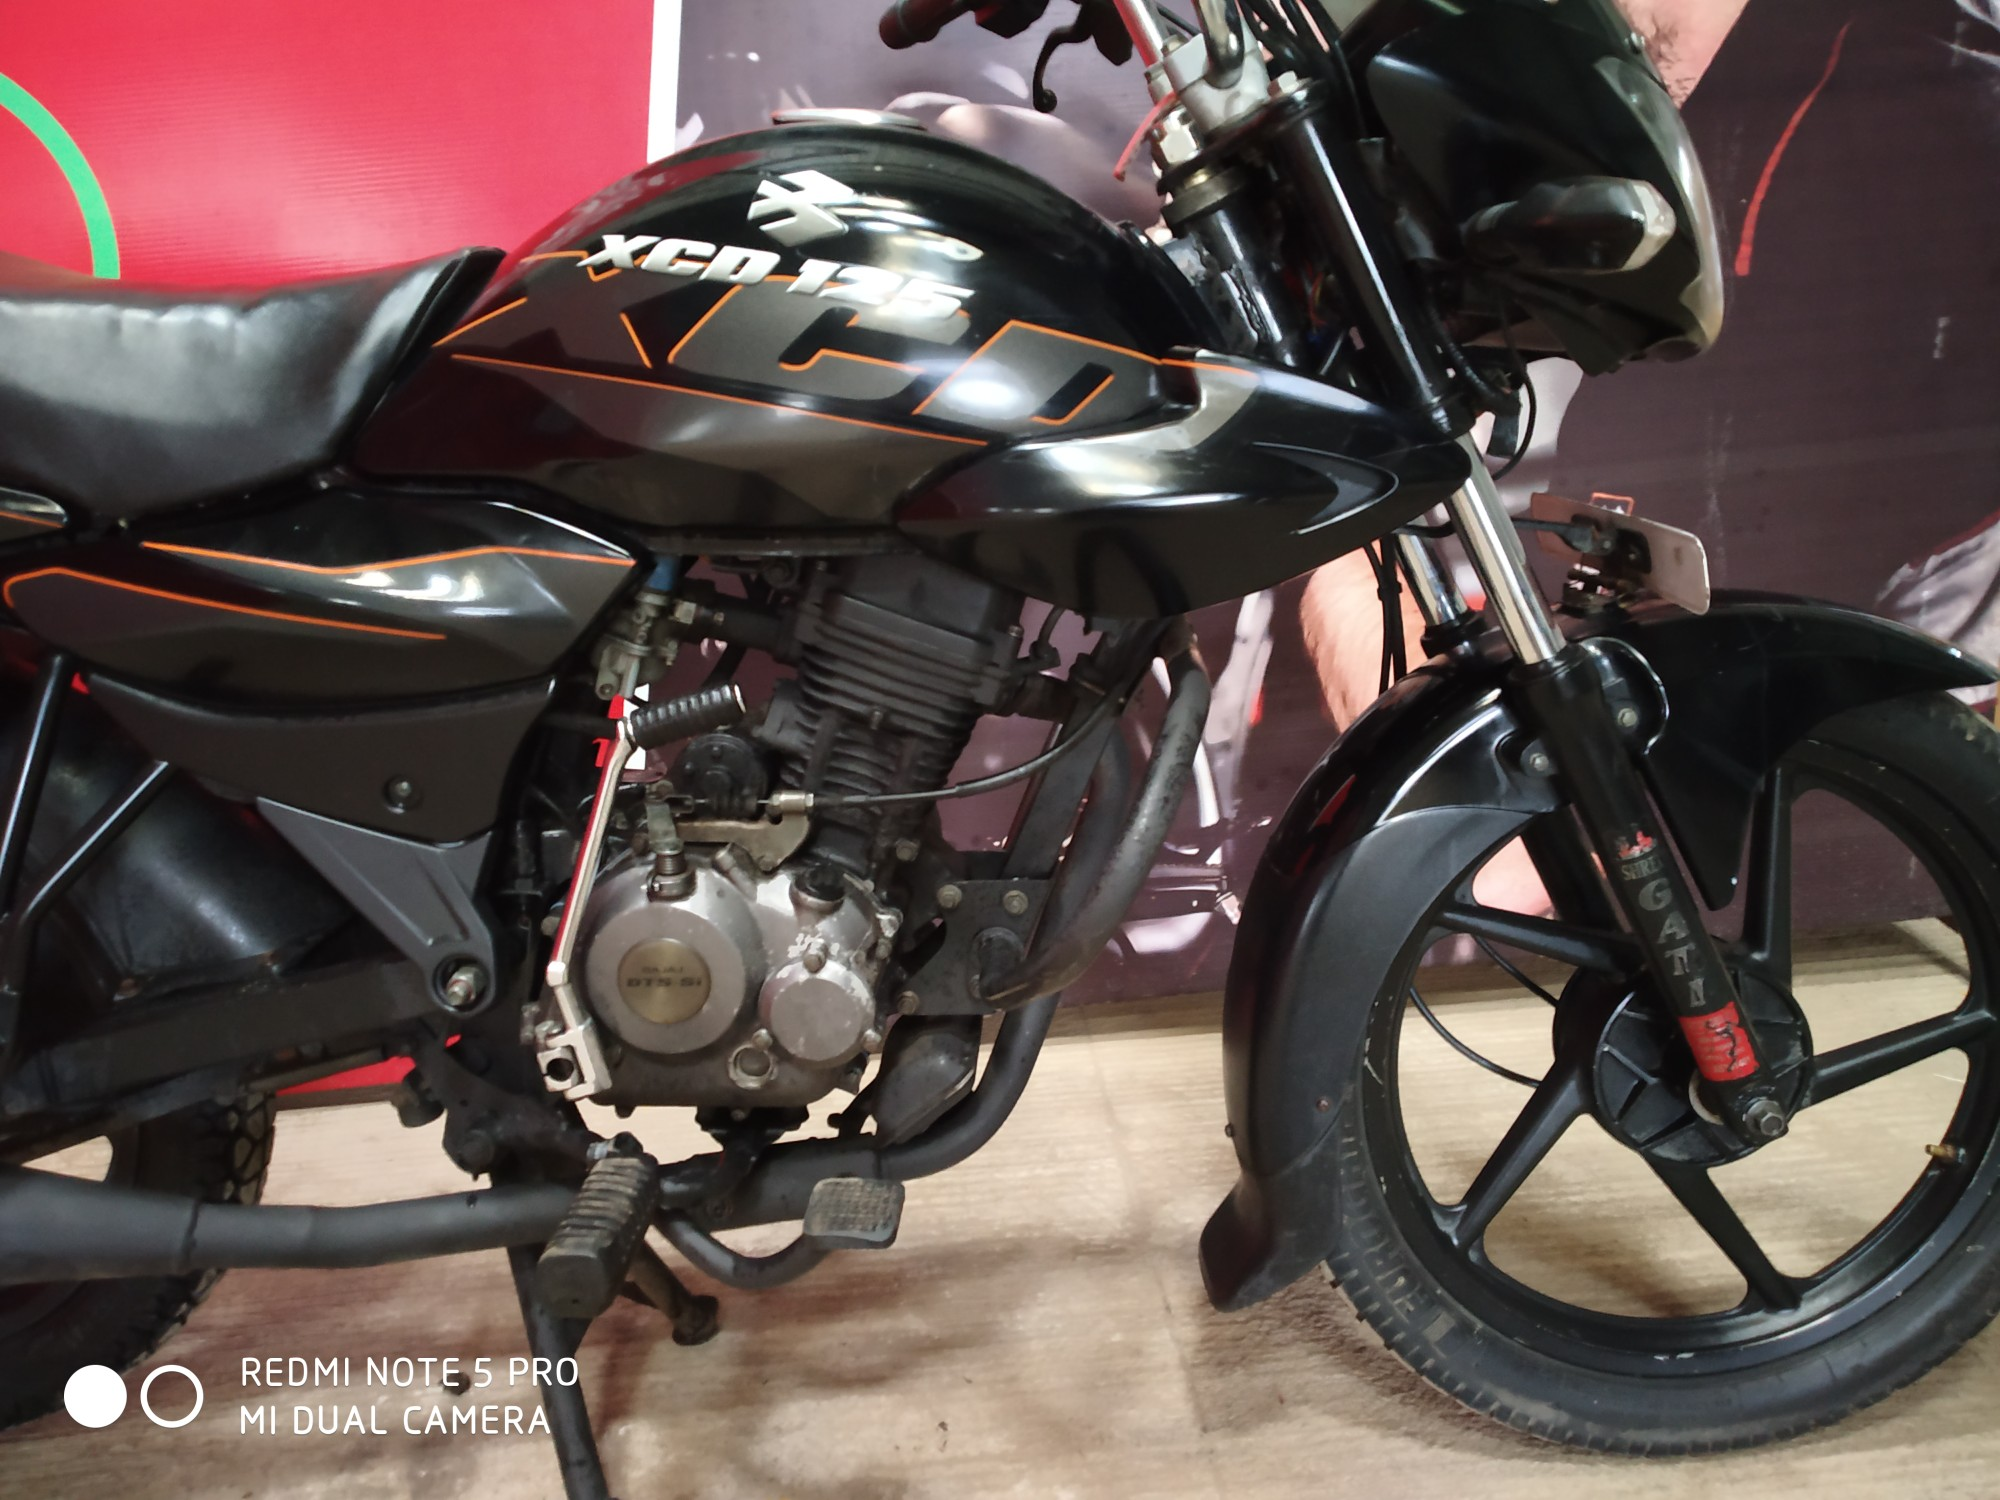 Bajaj Xcd 125 Refurbished Bike At Best Price Credr